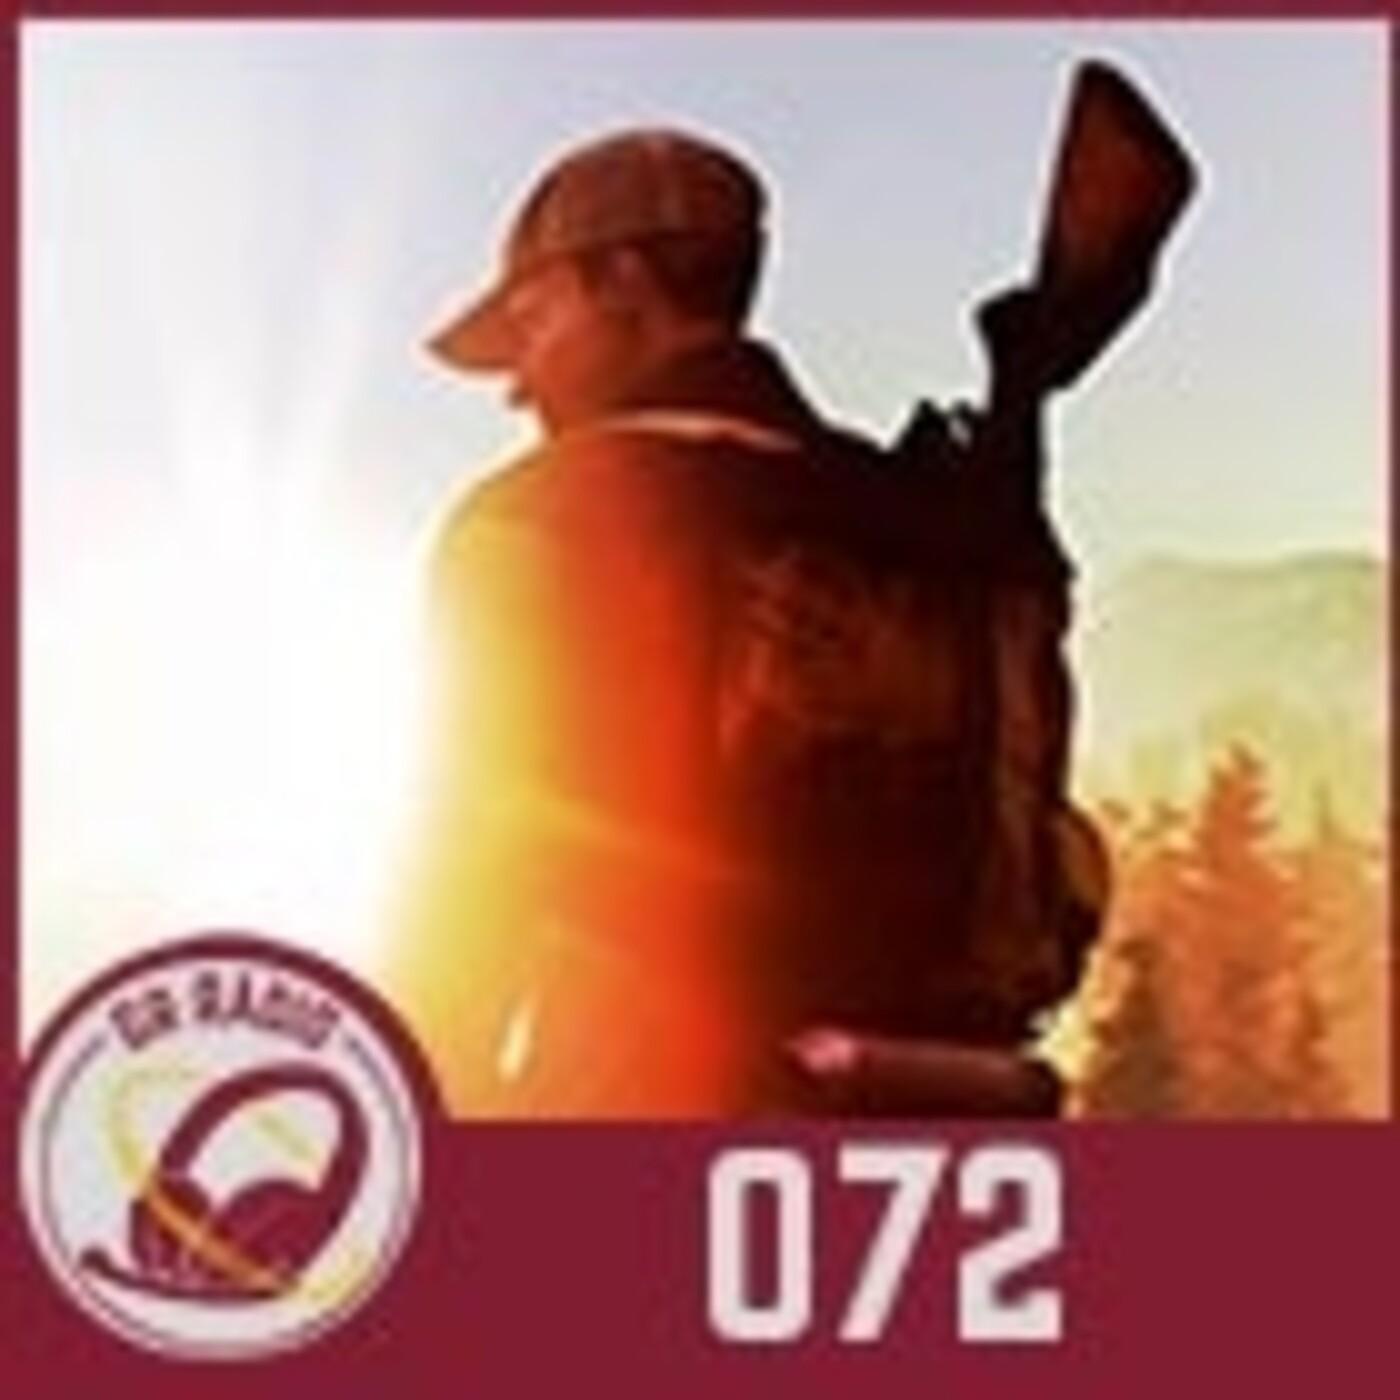 GR (072) SUMMER GAME FEST 2021 | ¿XCloud en SWITCH? | POLÉMICA del PELÍCARO | The Last of Us 2 ¡DESATADO! | OPEN COUNTRY